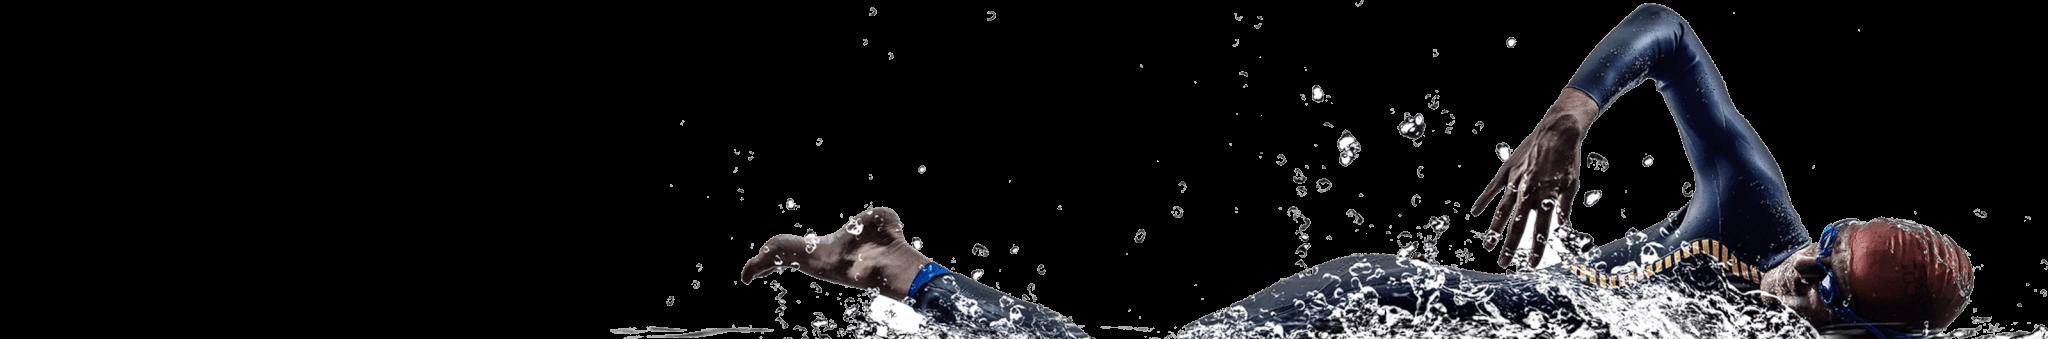 https://bewdleytennisclub.org.uk/wp-content/uploads/2017/10/inner_swimmer.png